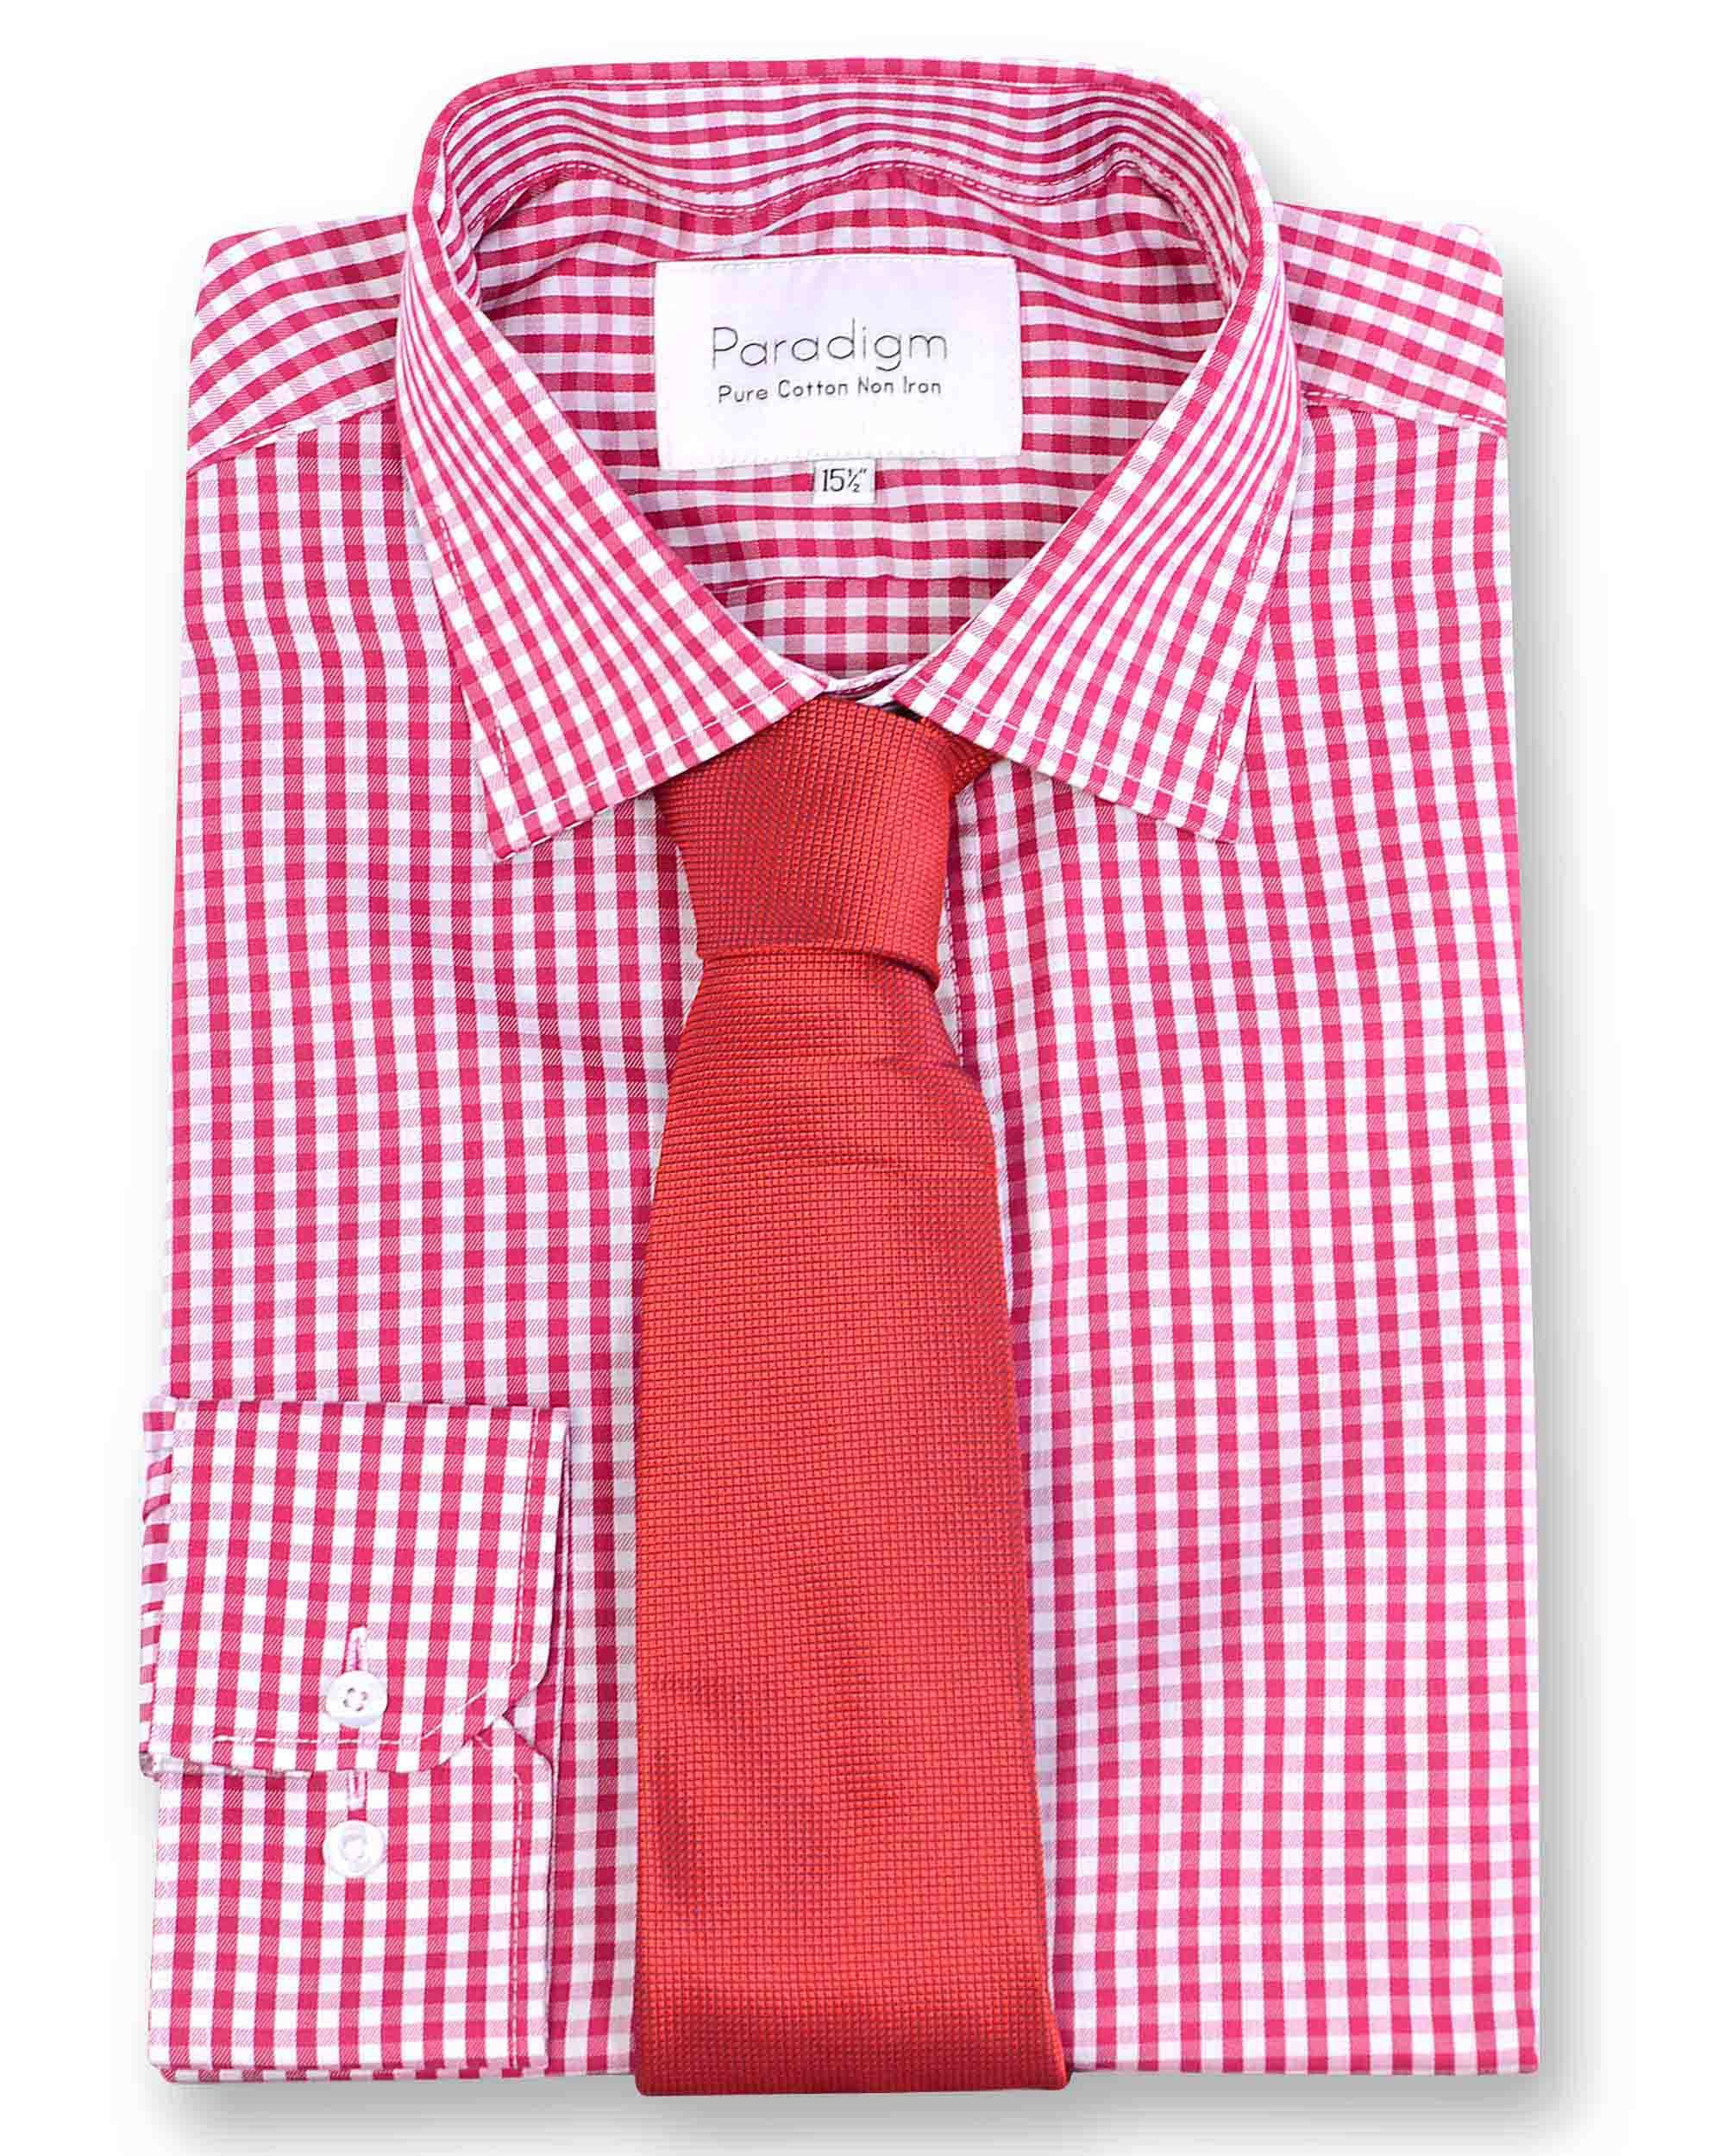 Men's Double TWO Paradigm 100% Cotton Non-Iron Check Shirt